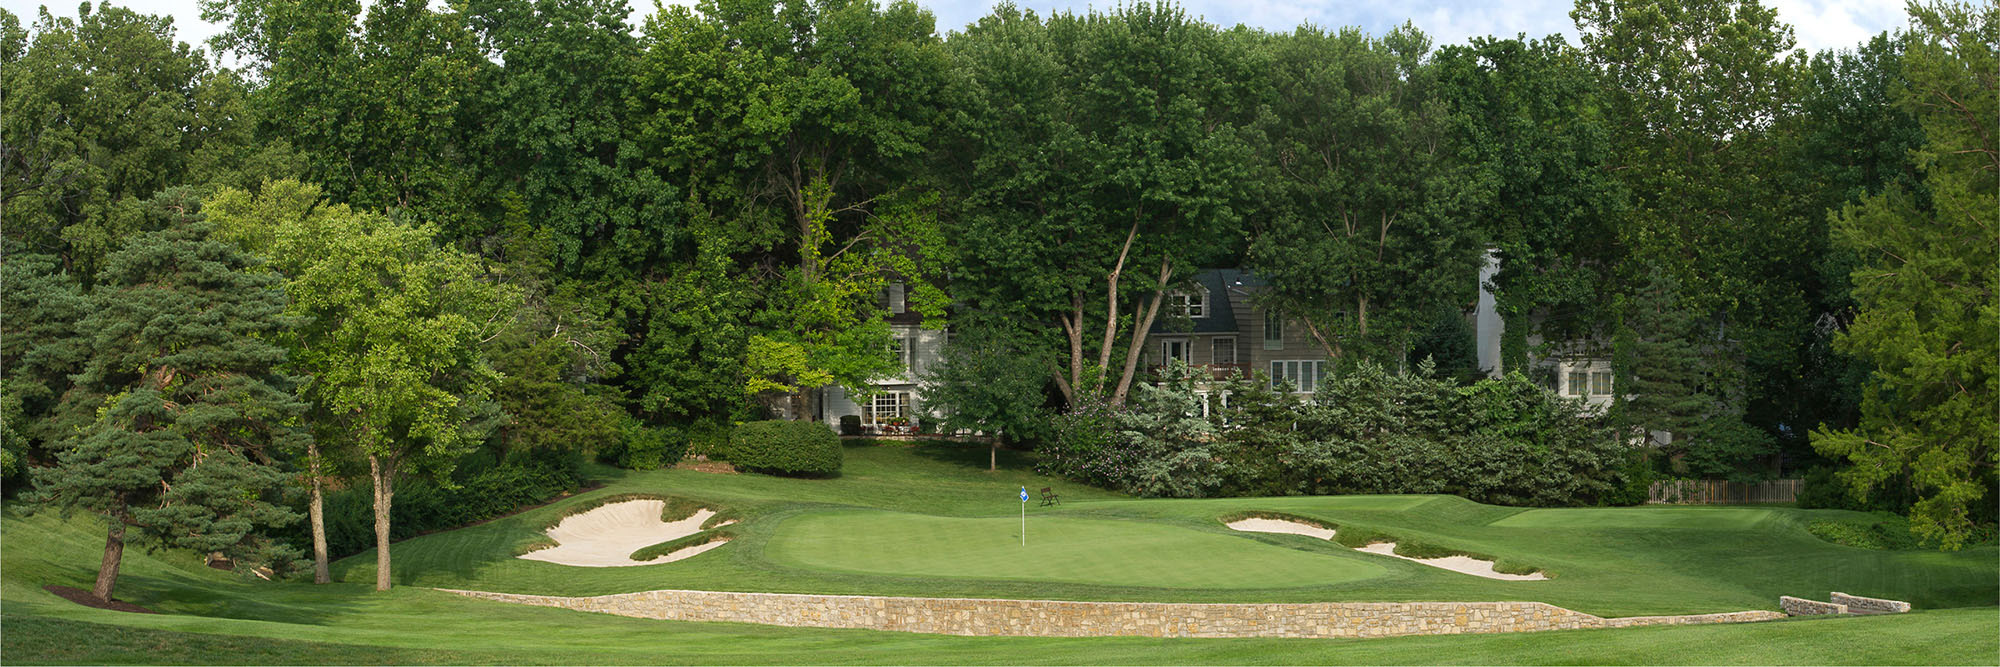 Golf Course Image - Mission Hills No. 11